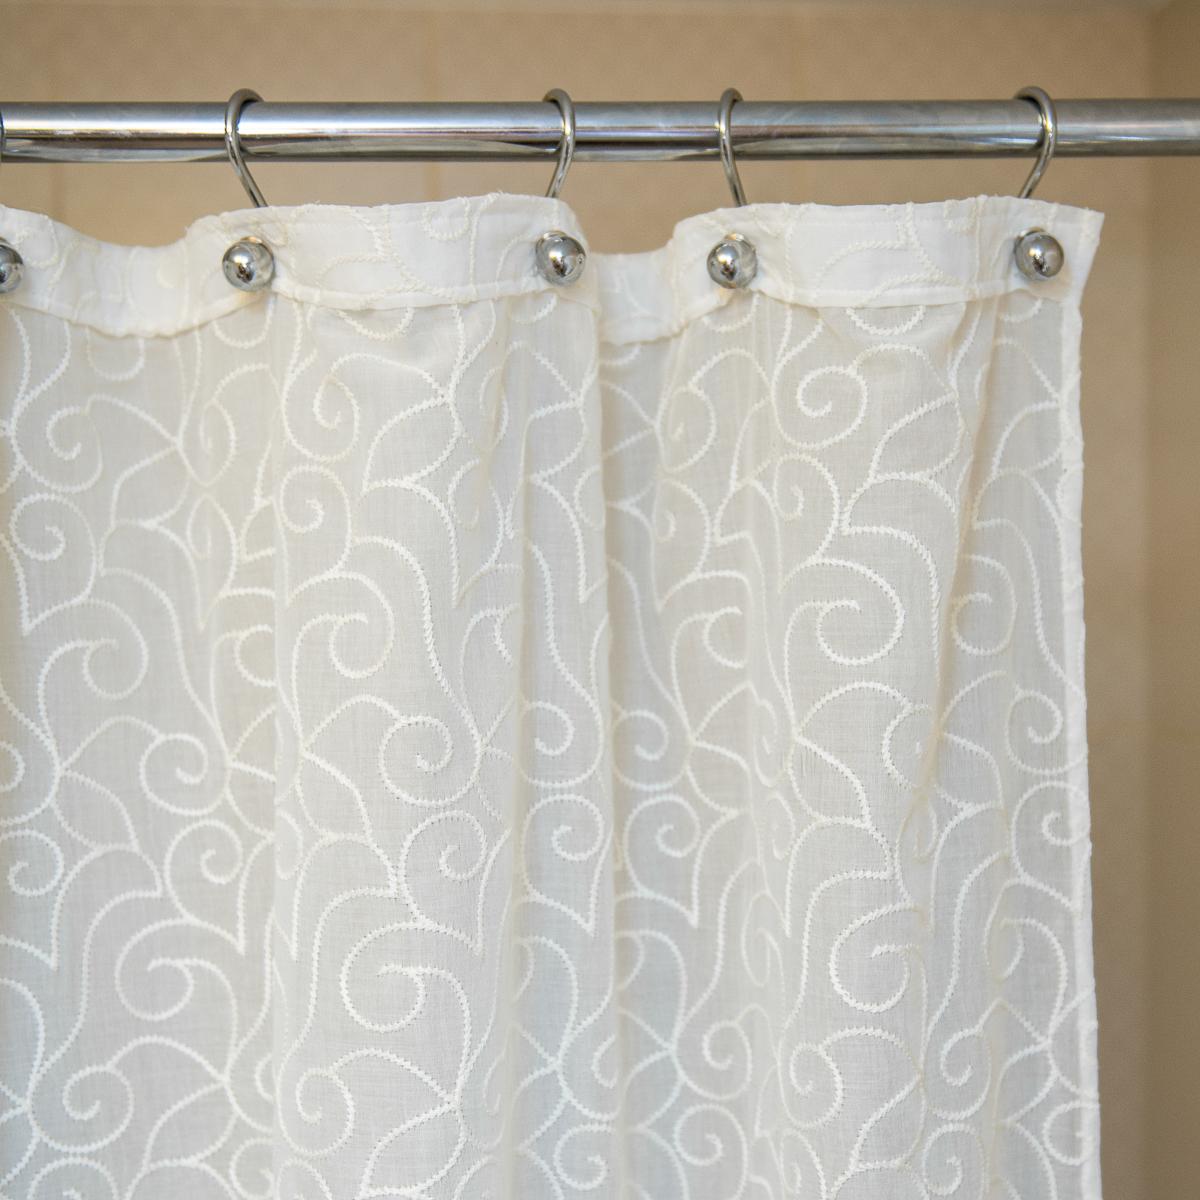 Шторки для ванной Шторка для ванной 200х240 Arti-Deco Embroidery 2555 elitnaya-shtorka-dlya-vannoy-200h240-embroidery-2555-ot-arti-deco-ispaniya.jpg